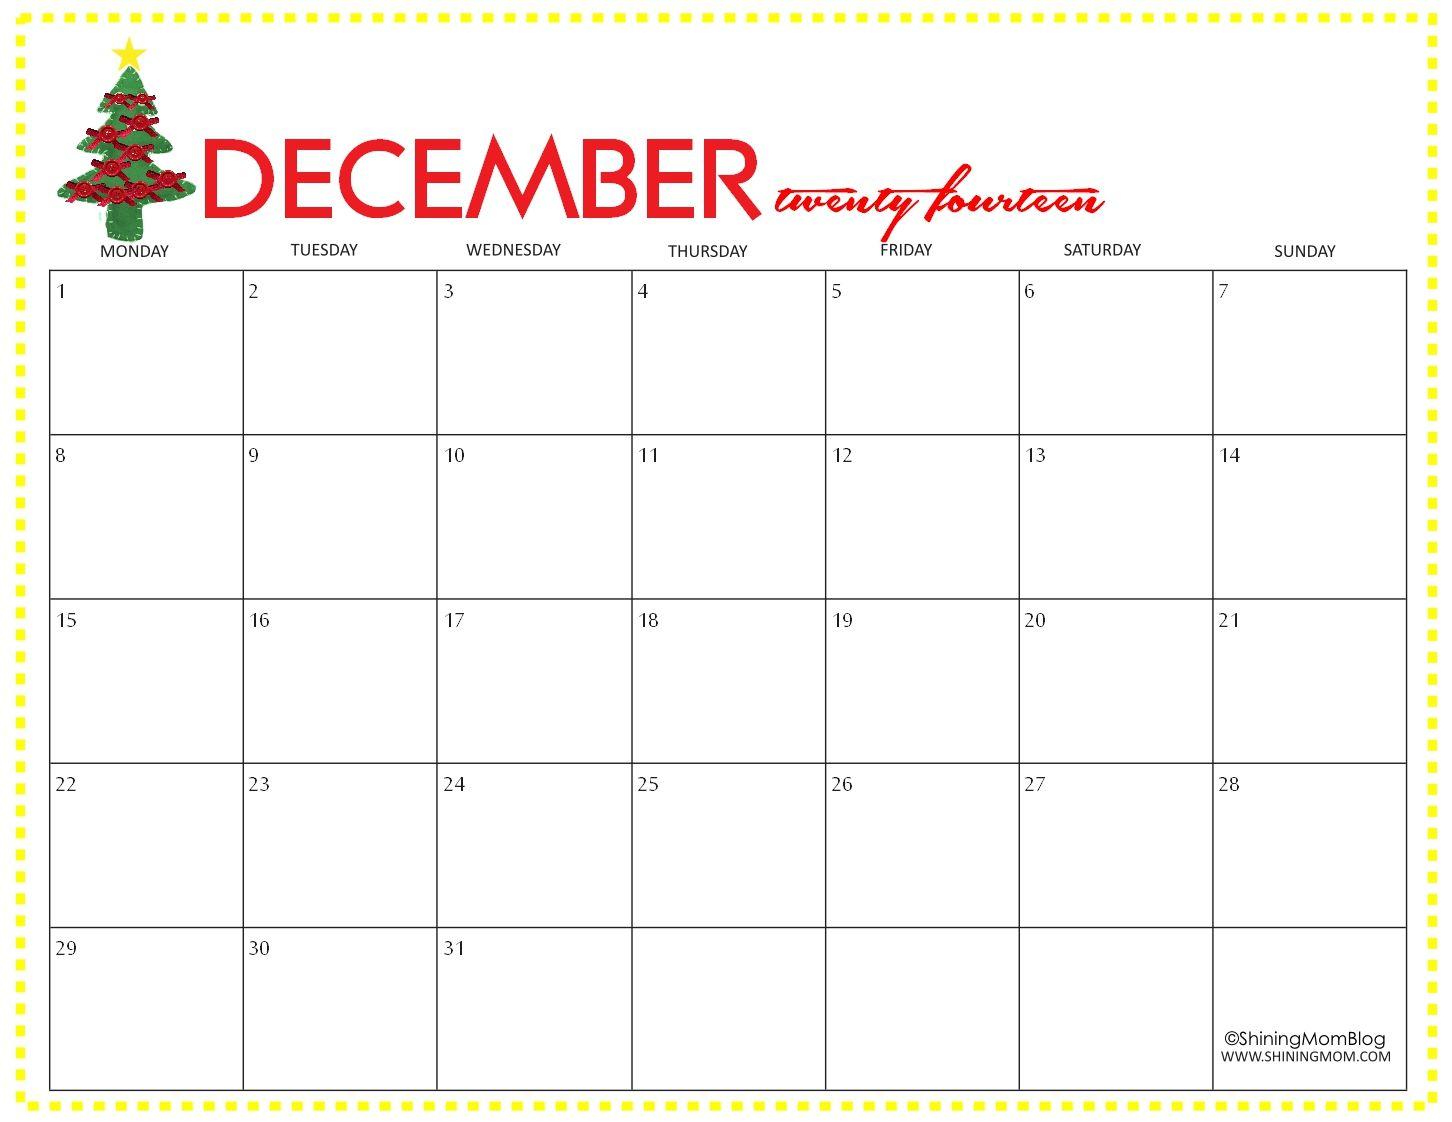 Blank Calendar December 2018 Printable   December 2018 Calendar for December Printable Monthly Calendar Templates